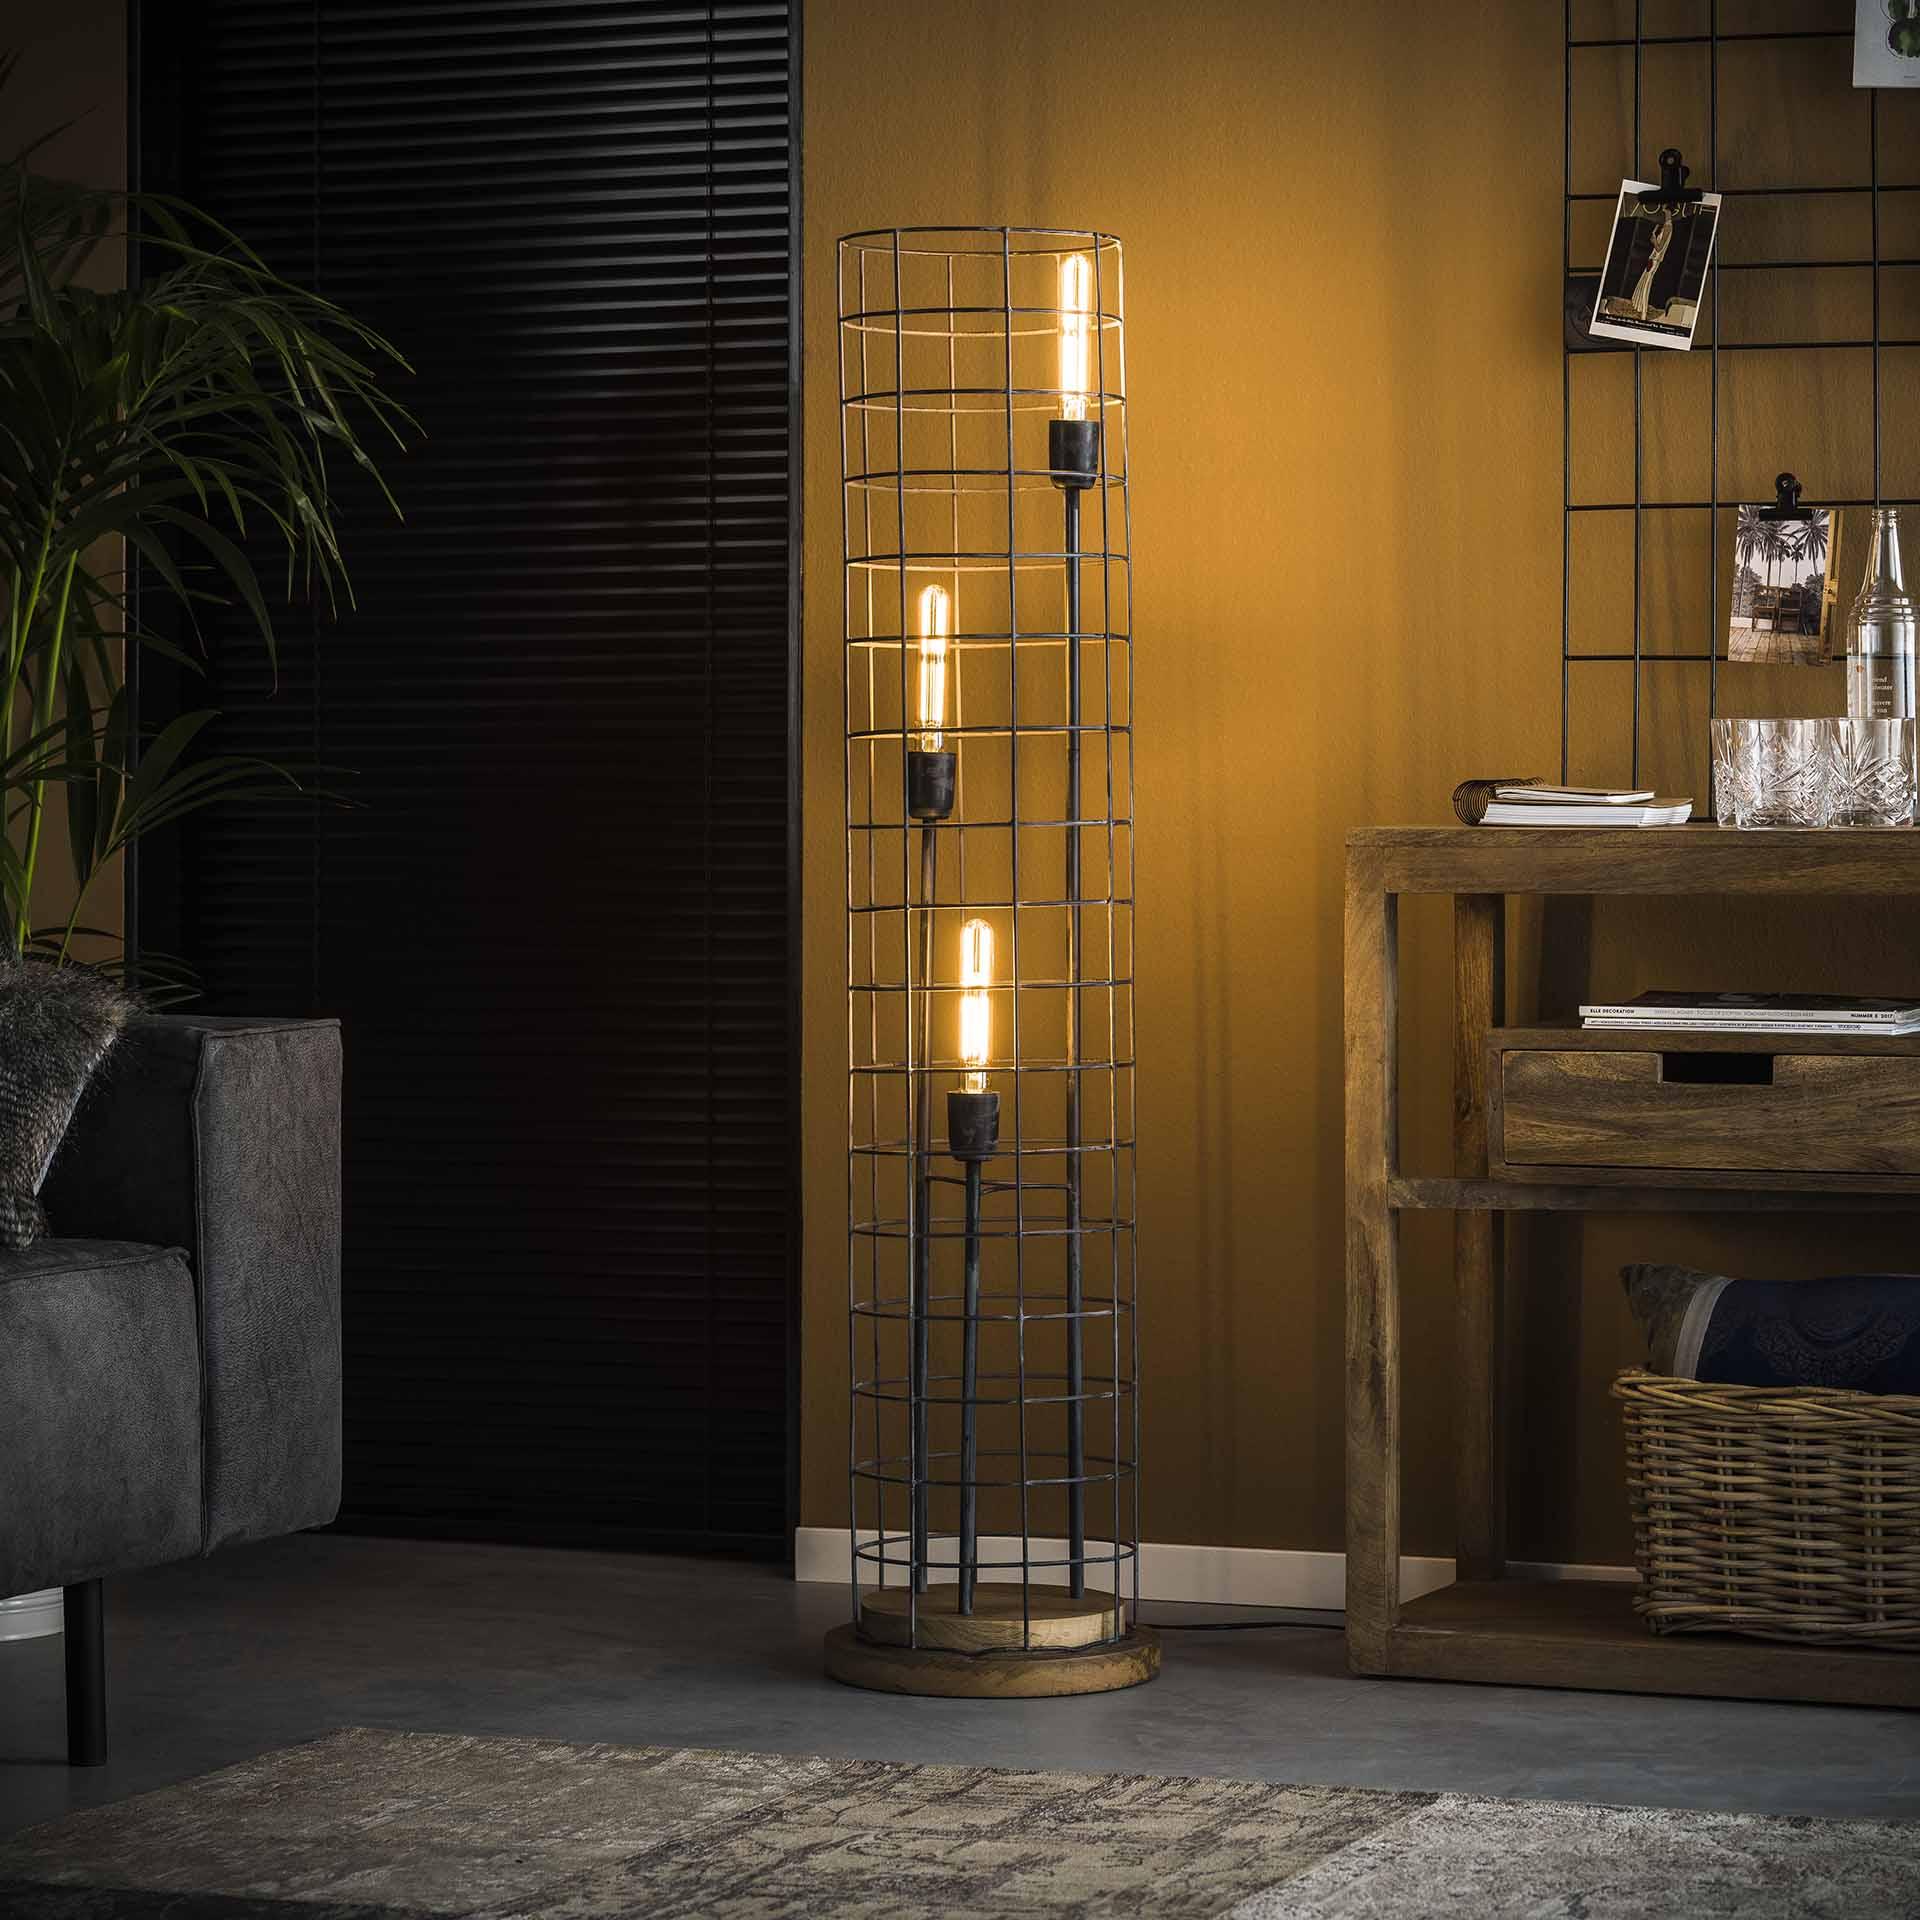 Vloerlamp 3L Ø31 gaas houten voet - Grijs